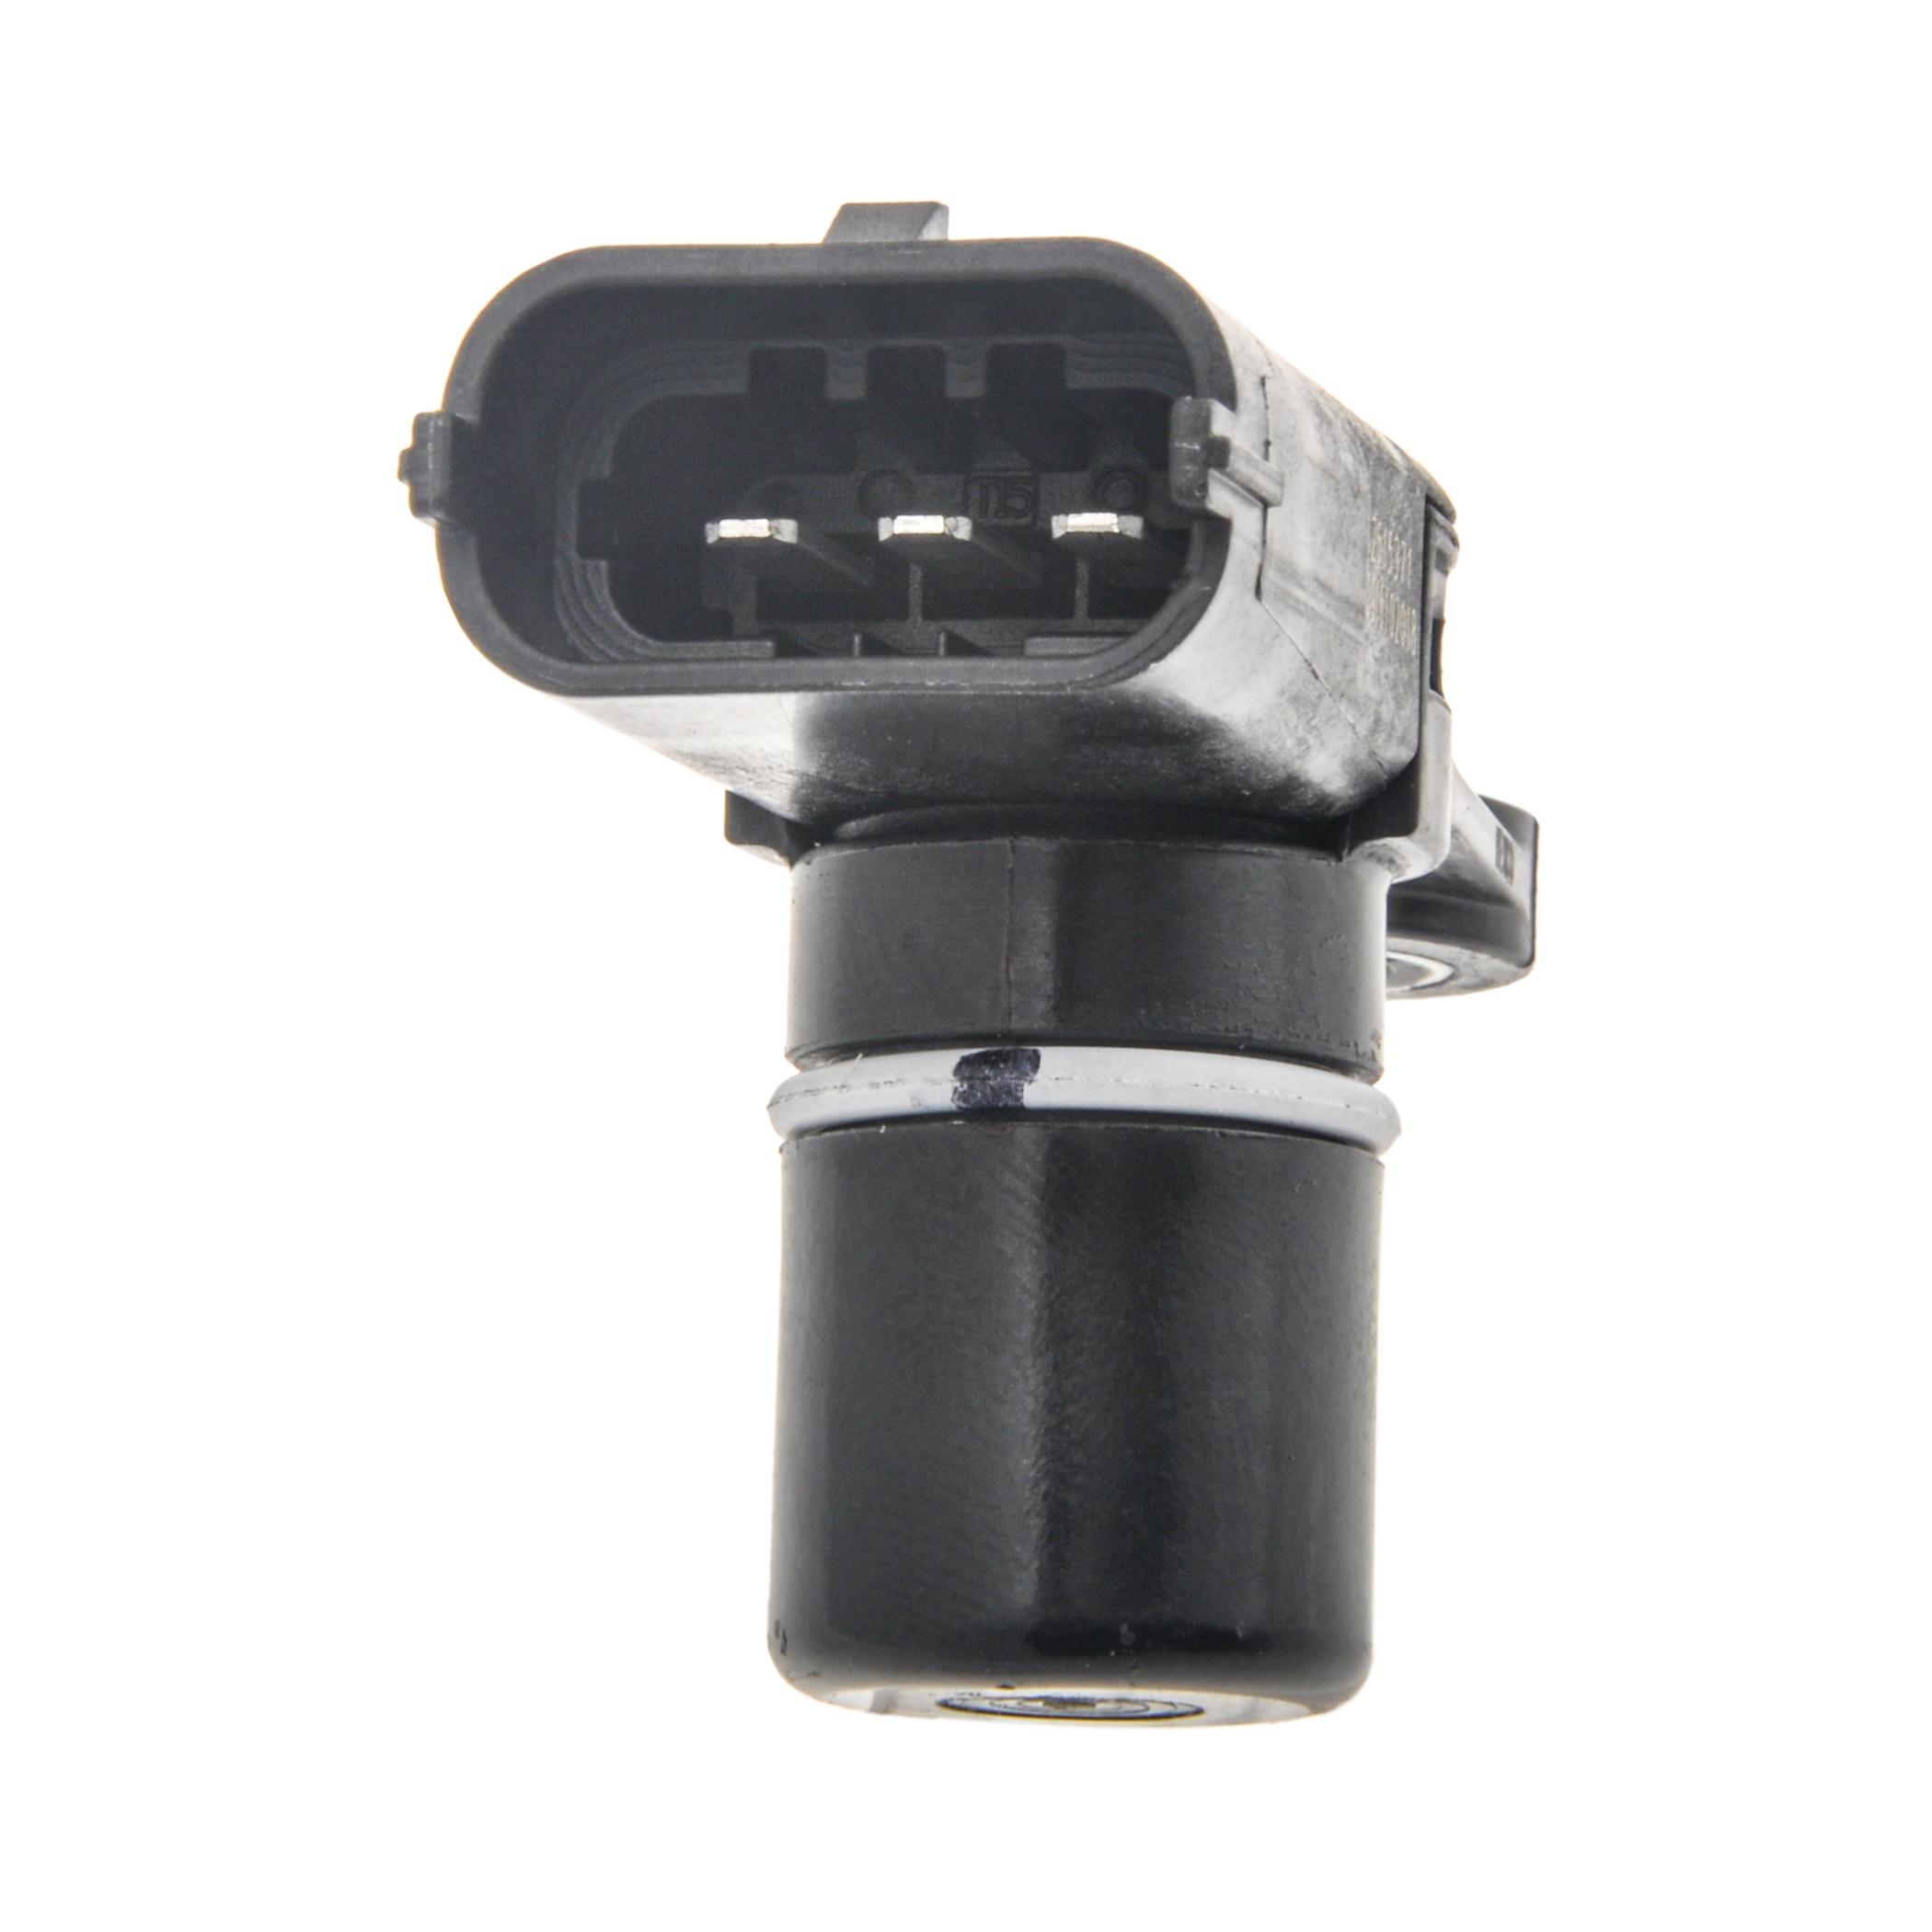 OEM Camshaft Position Sensor For Chevrolet Cadillac 12615371 SU13631 S10420